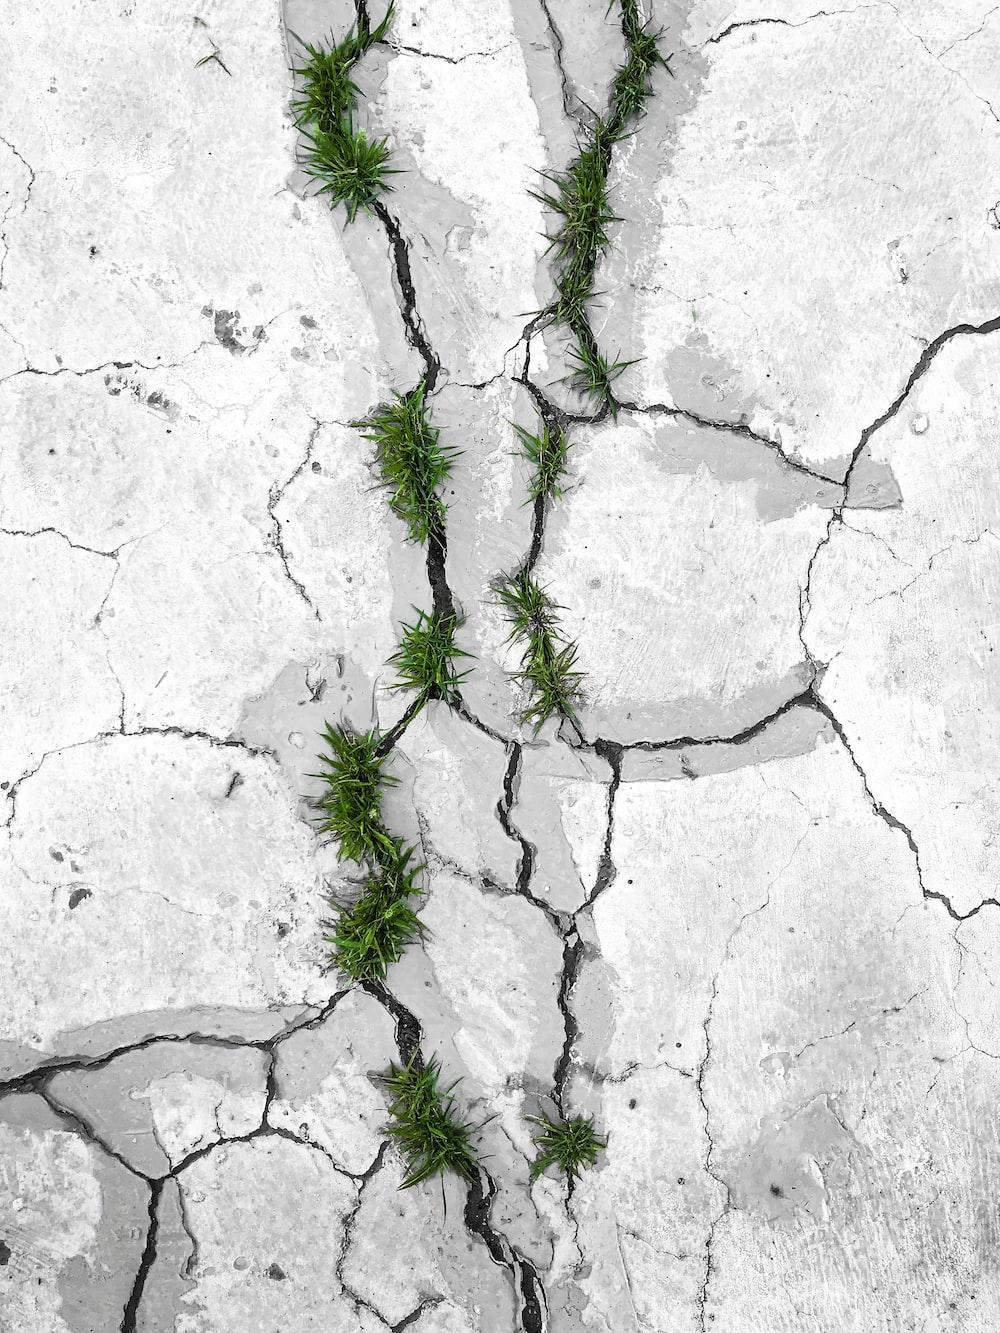 green grass on concrete cracks